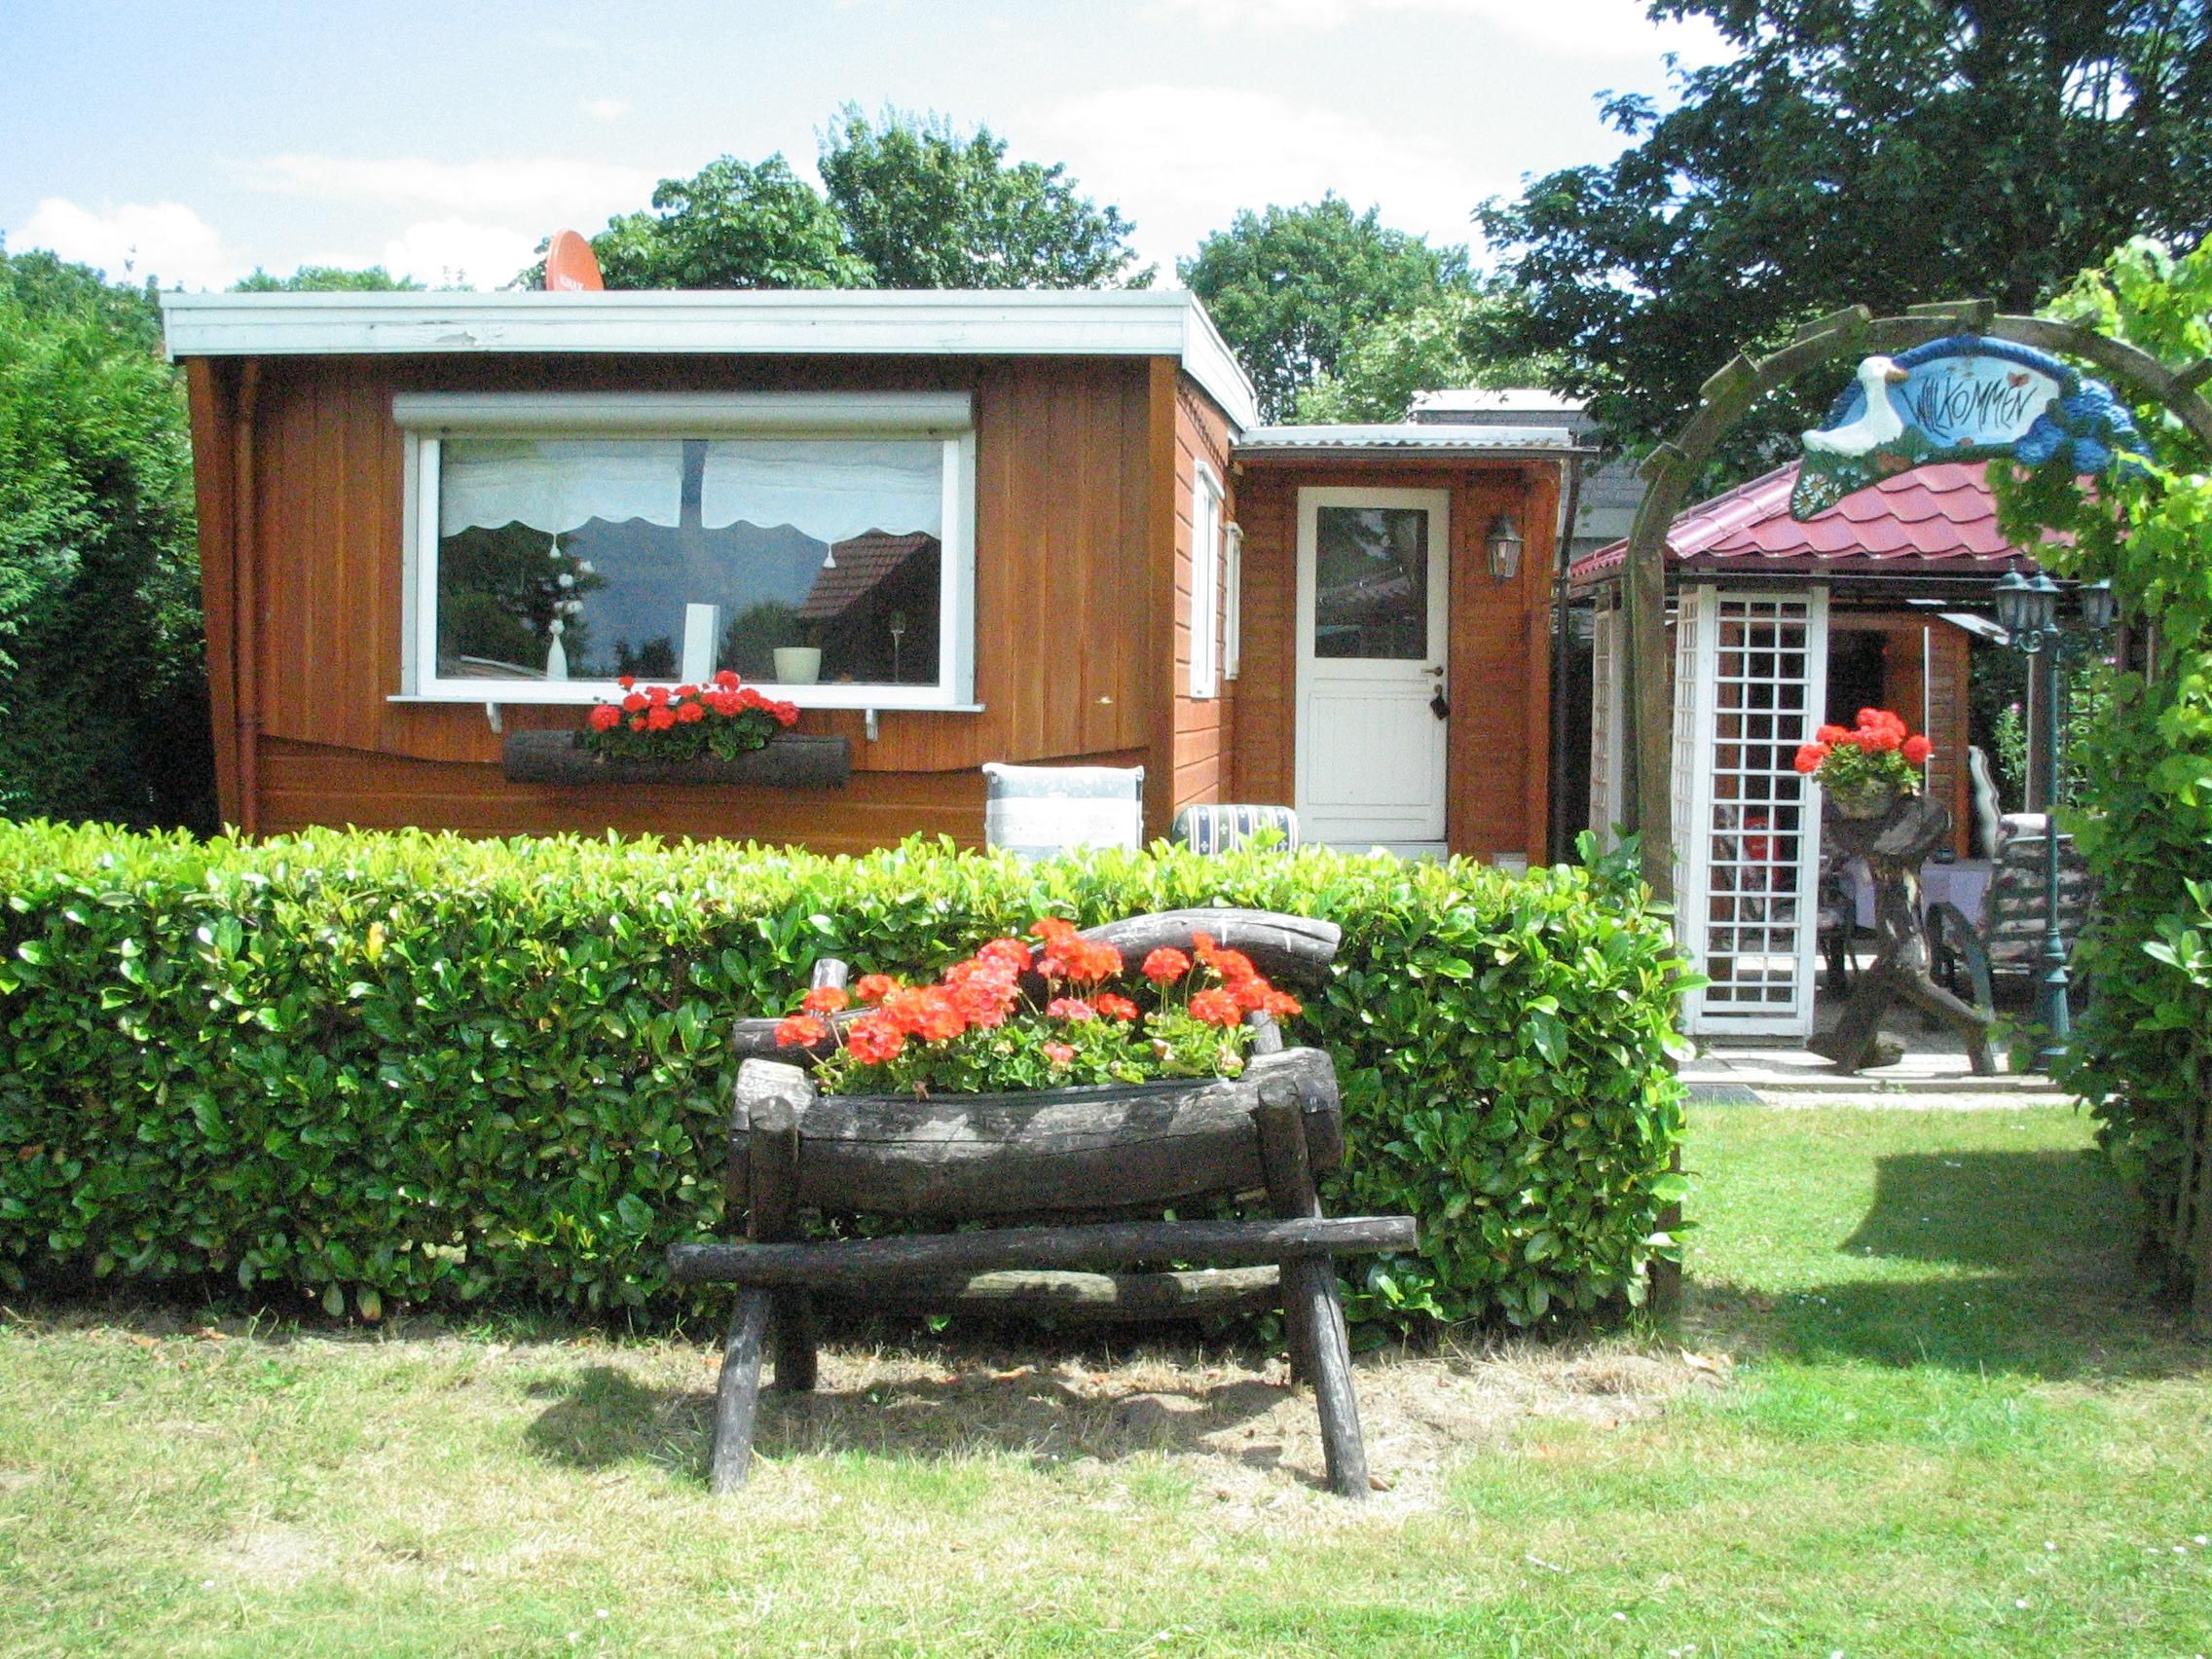 mobilheim kaufen ludwigsee campingplatz pachten. Black Bedroom Furniture Sets. Home Design Ideas